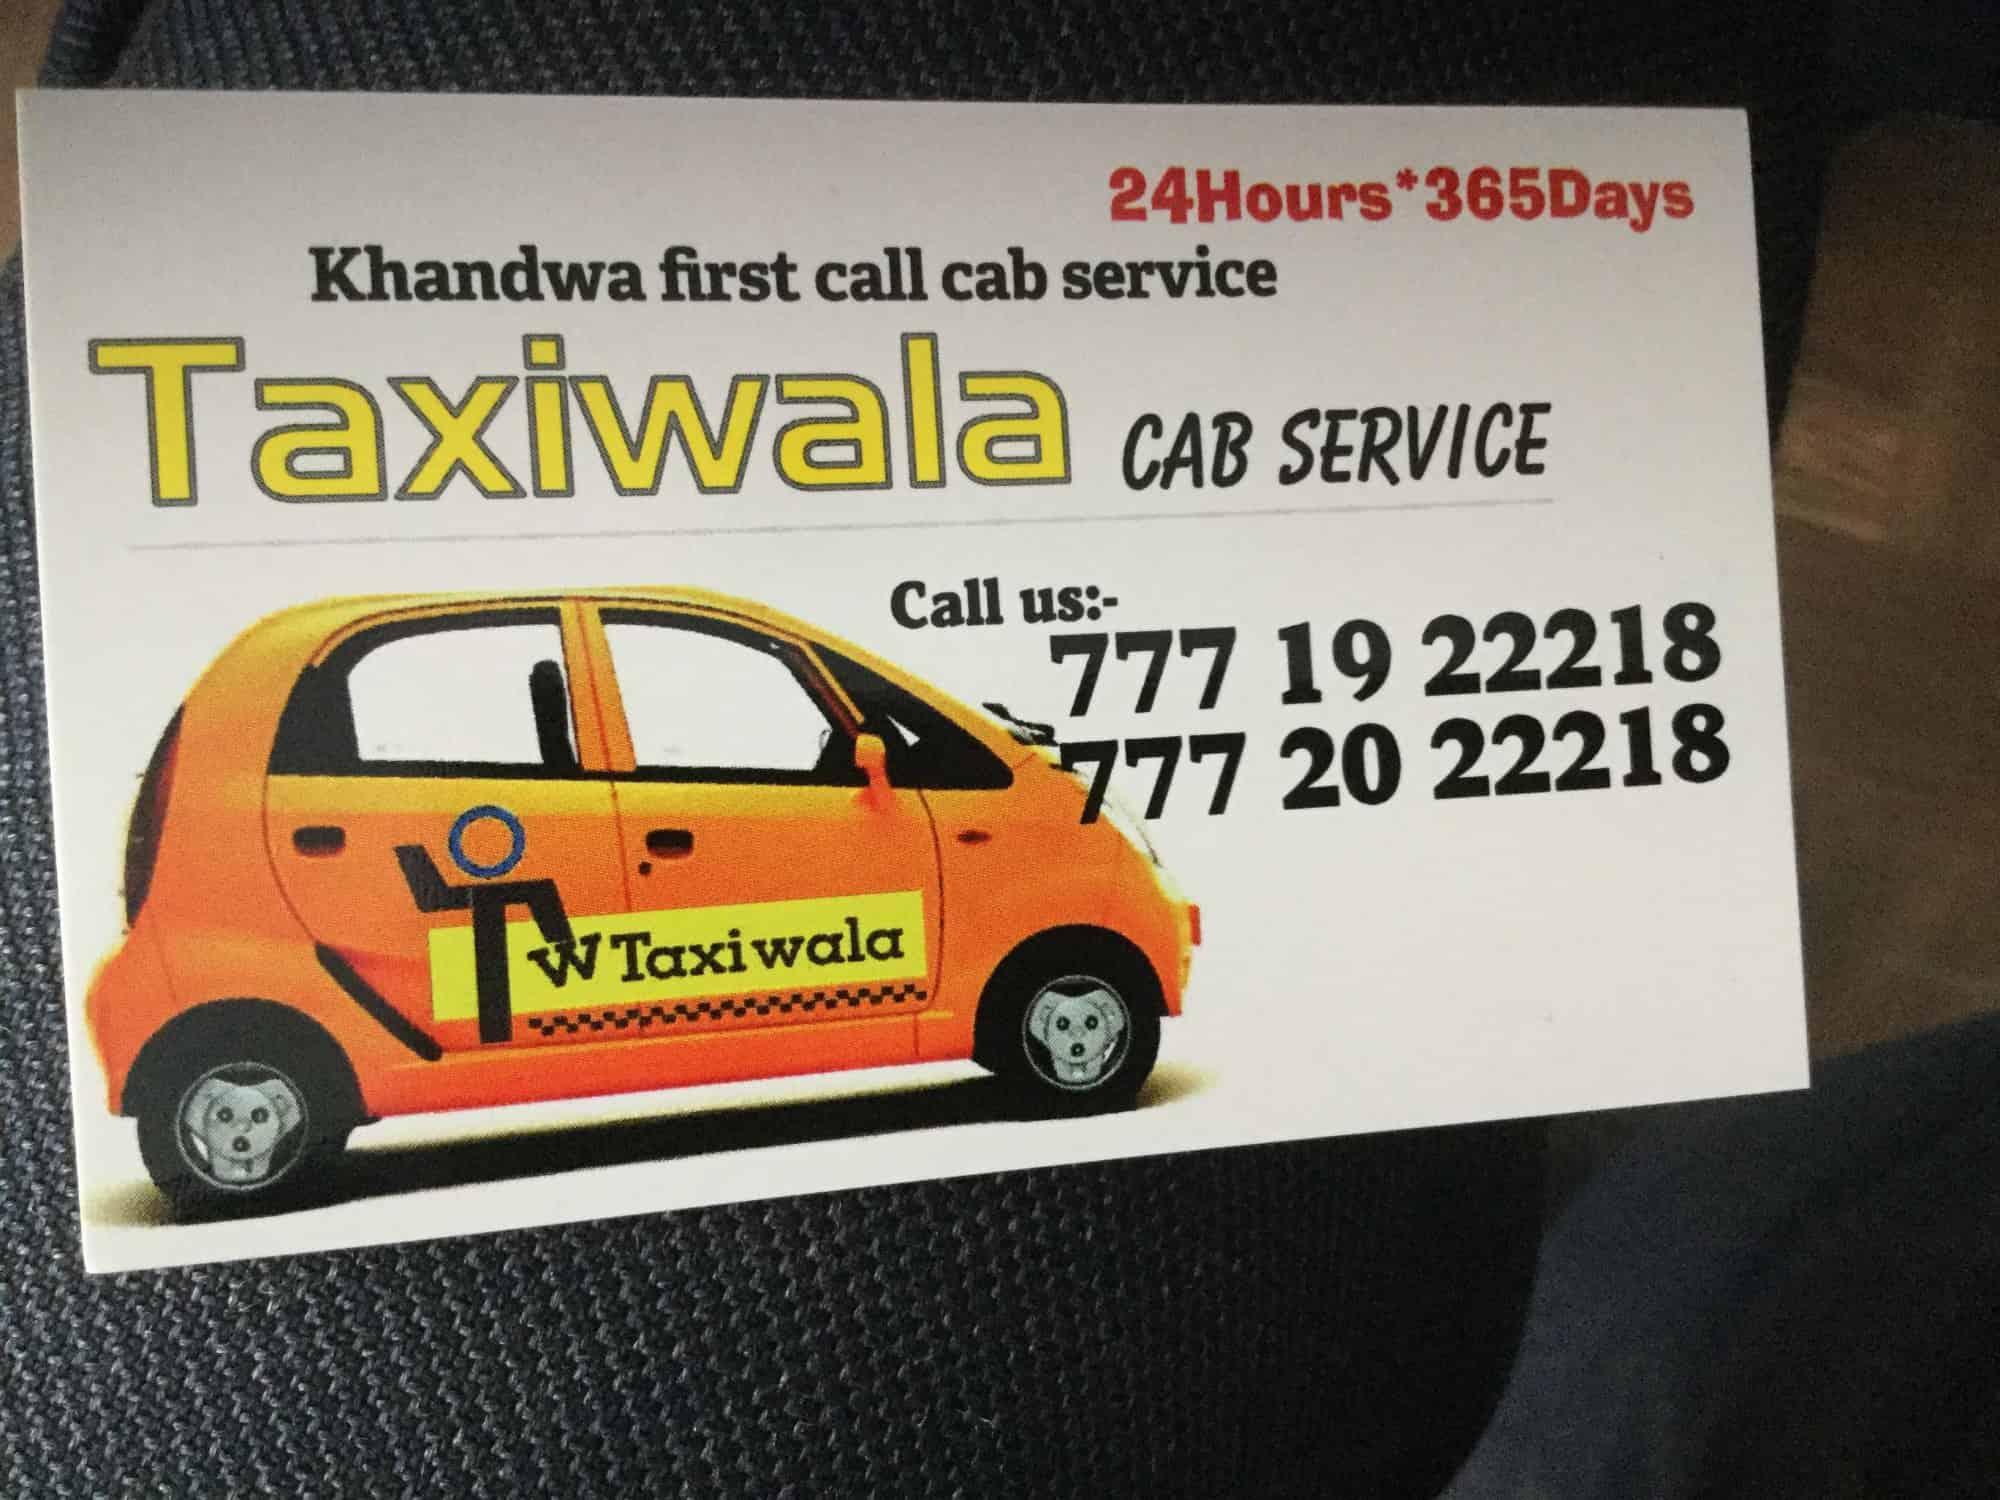 Taxiwala Cab Service Mali Kua Car Hire In Khandwa Justdial